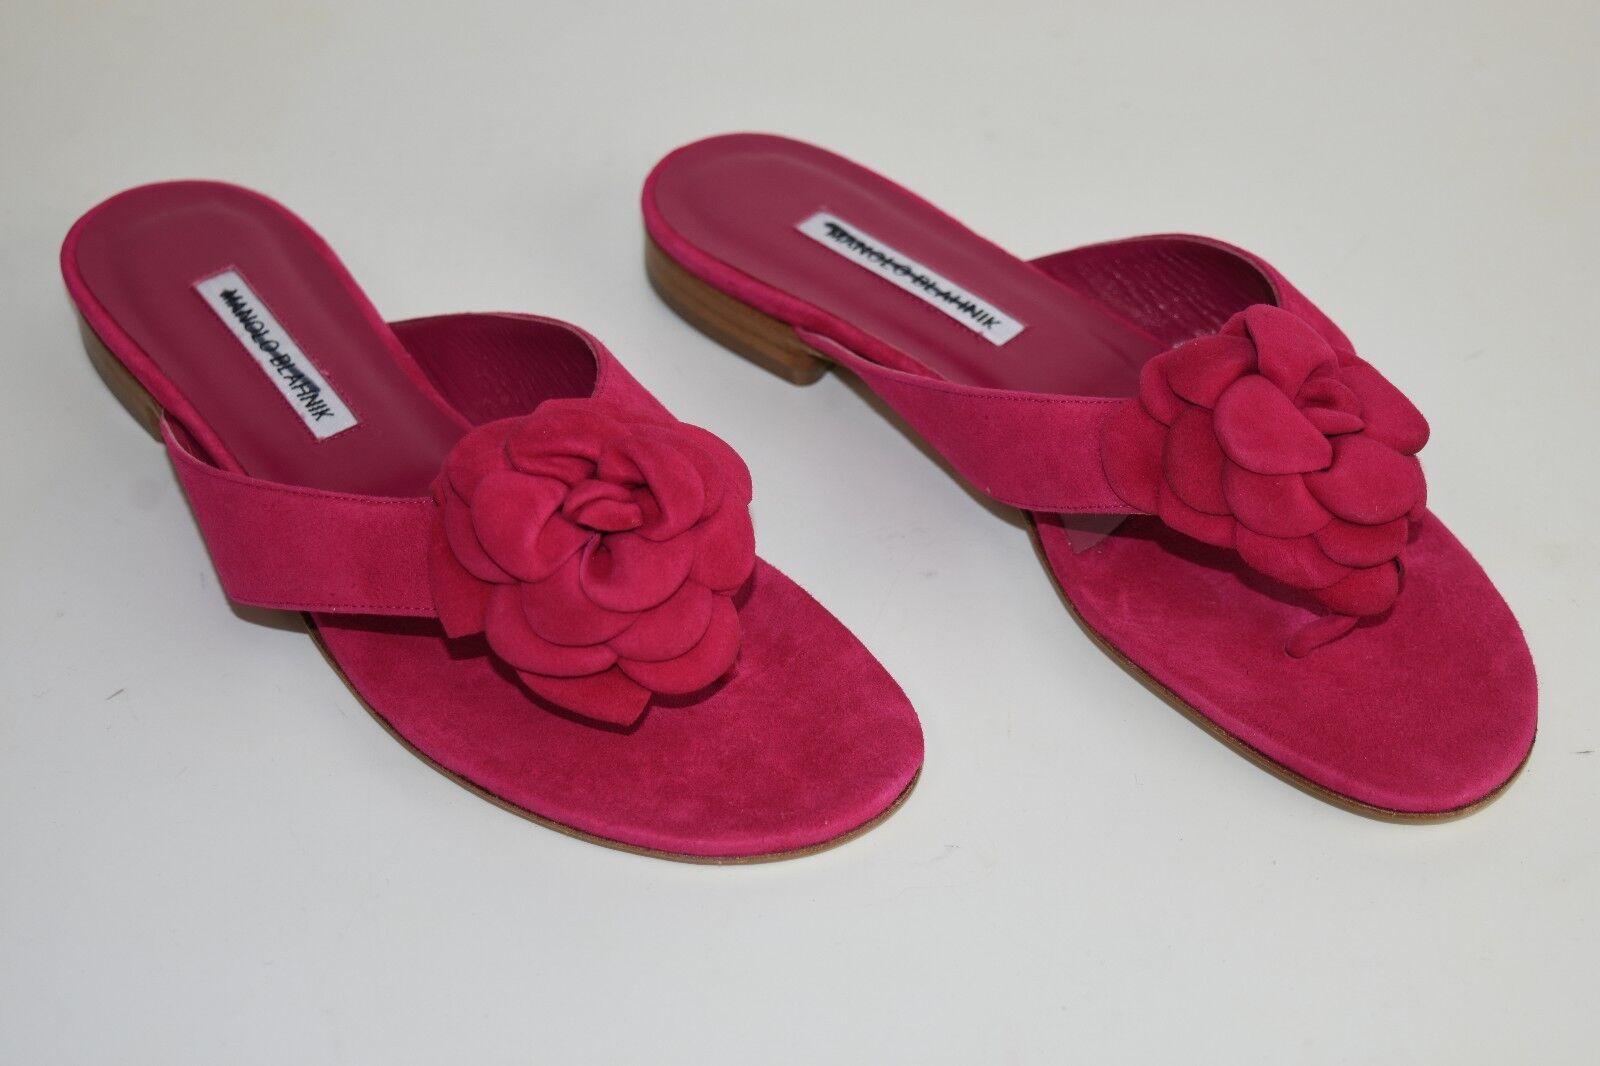 Nuevo Manolo Manolo Manolo Blahnik Petala 3 D rosado De Ante Sandalias Zapatos de diapositivas de Camelia 41 41.5  garantizado